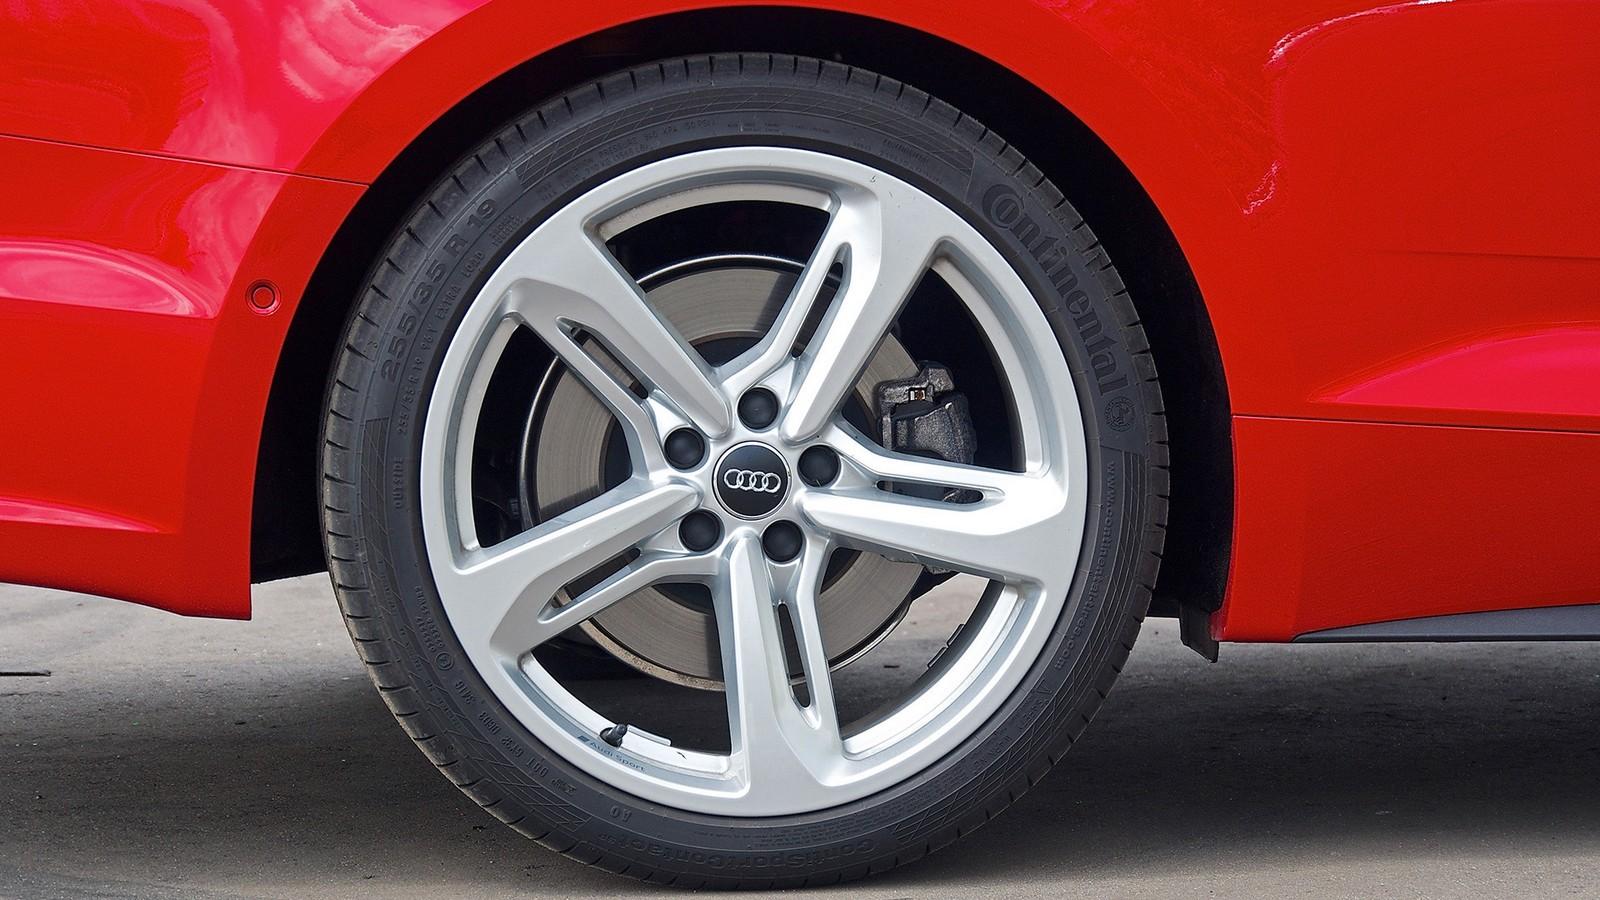 Audi_A5_Coupe_22